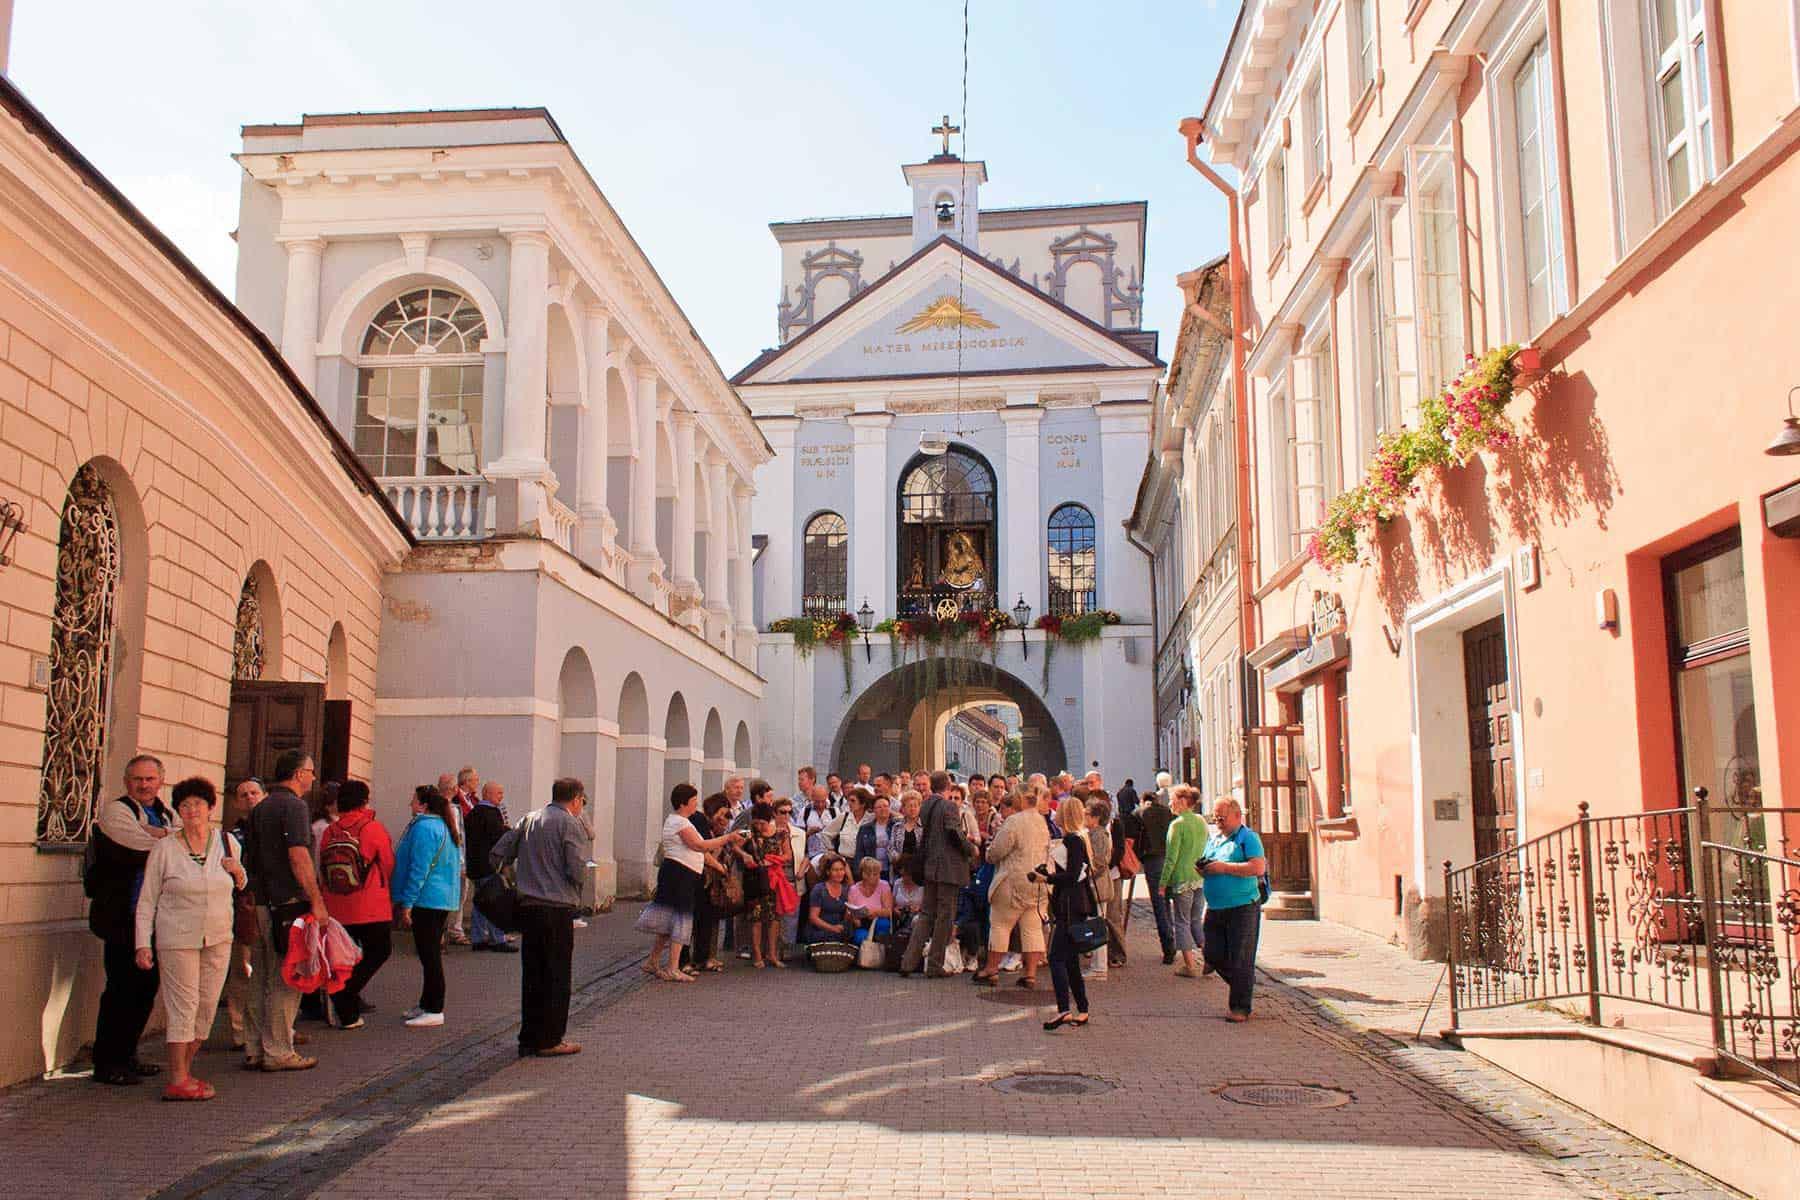 Resor_Litauen_Ausros-Vartu-Street-Gates-of-Dawn_nygren_lind